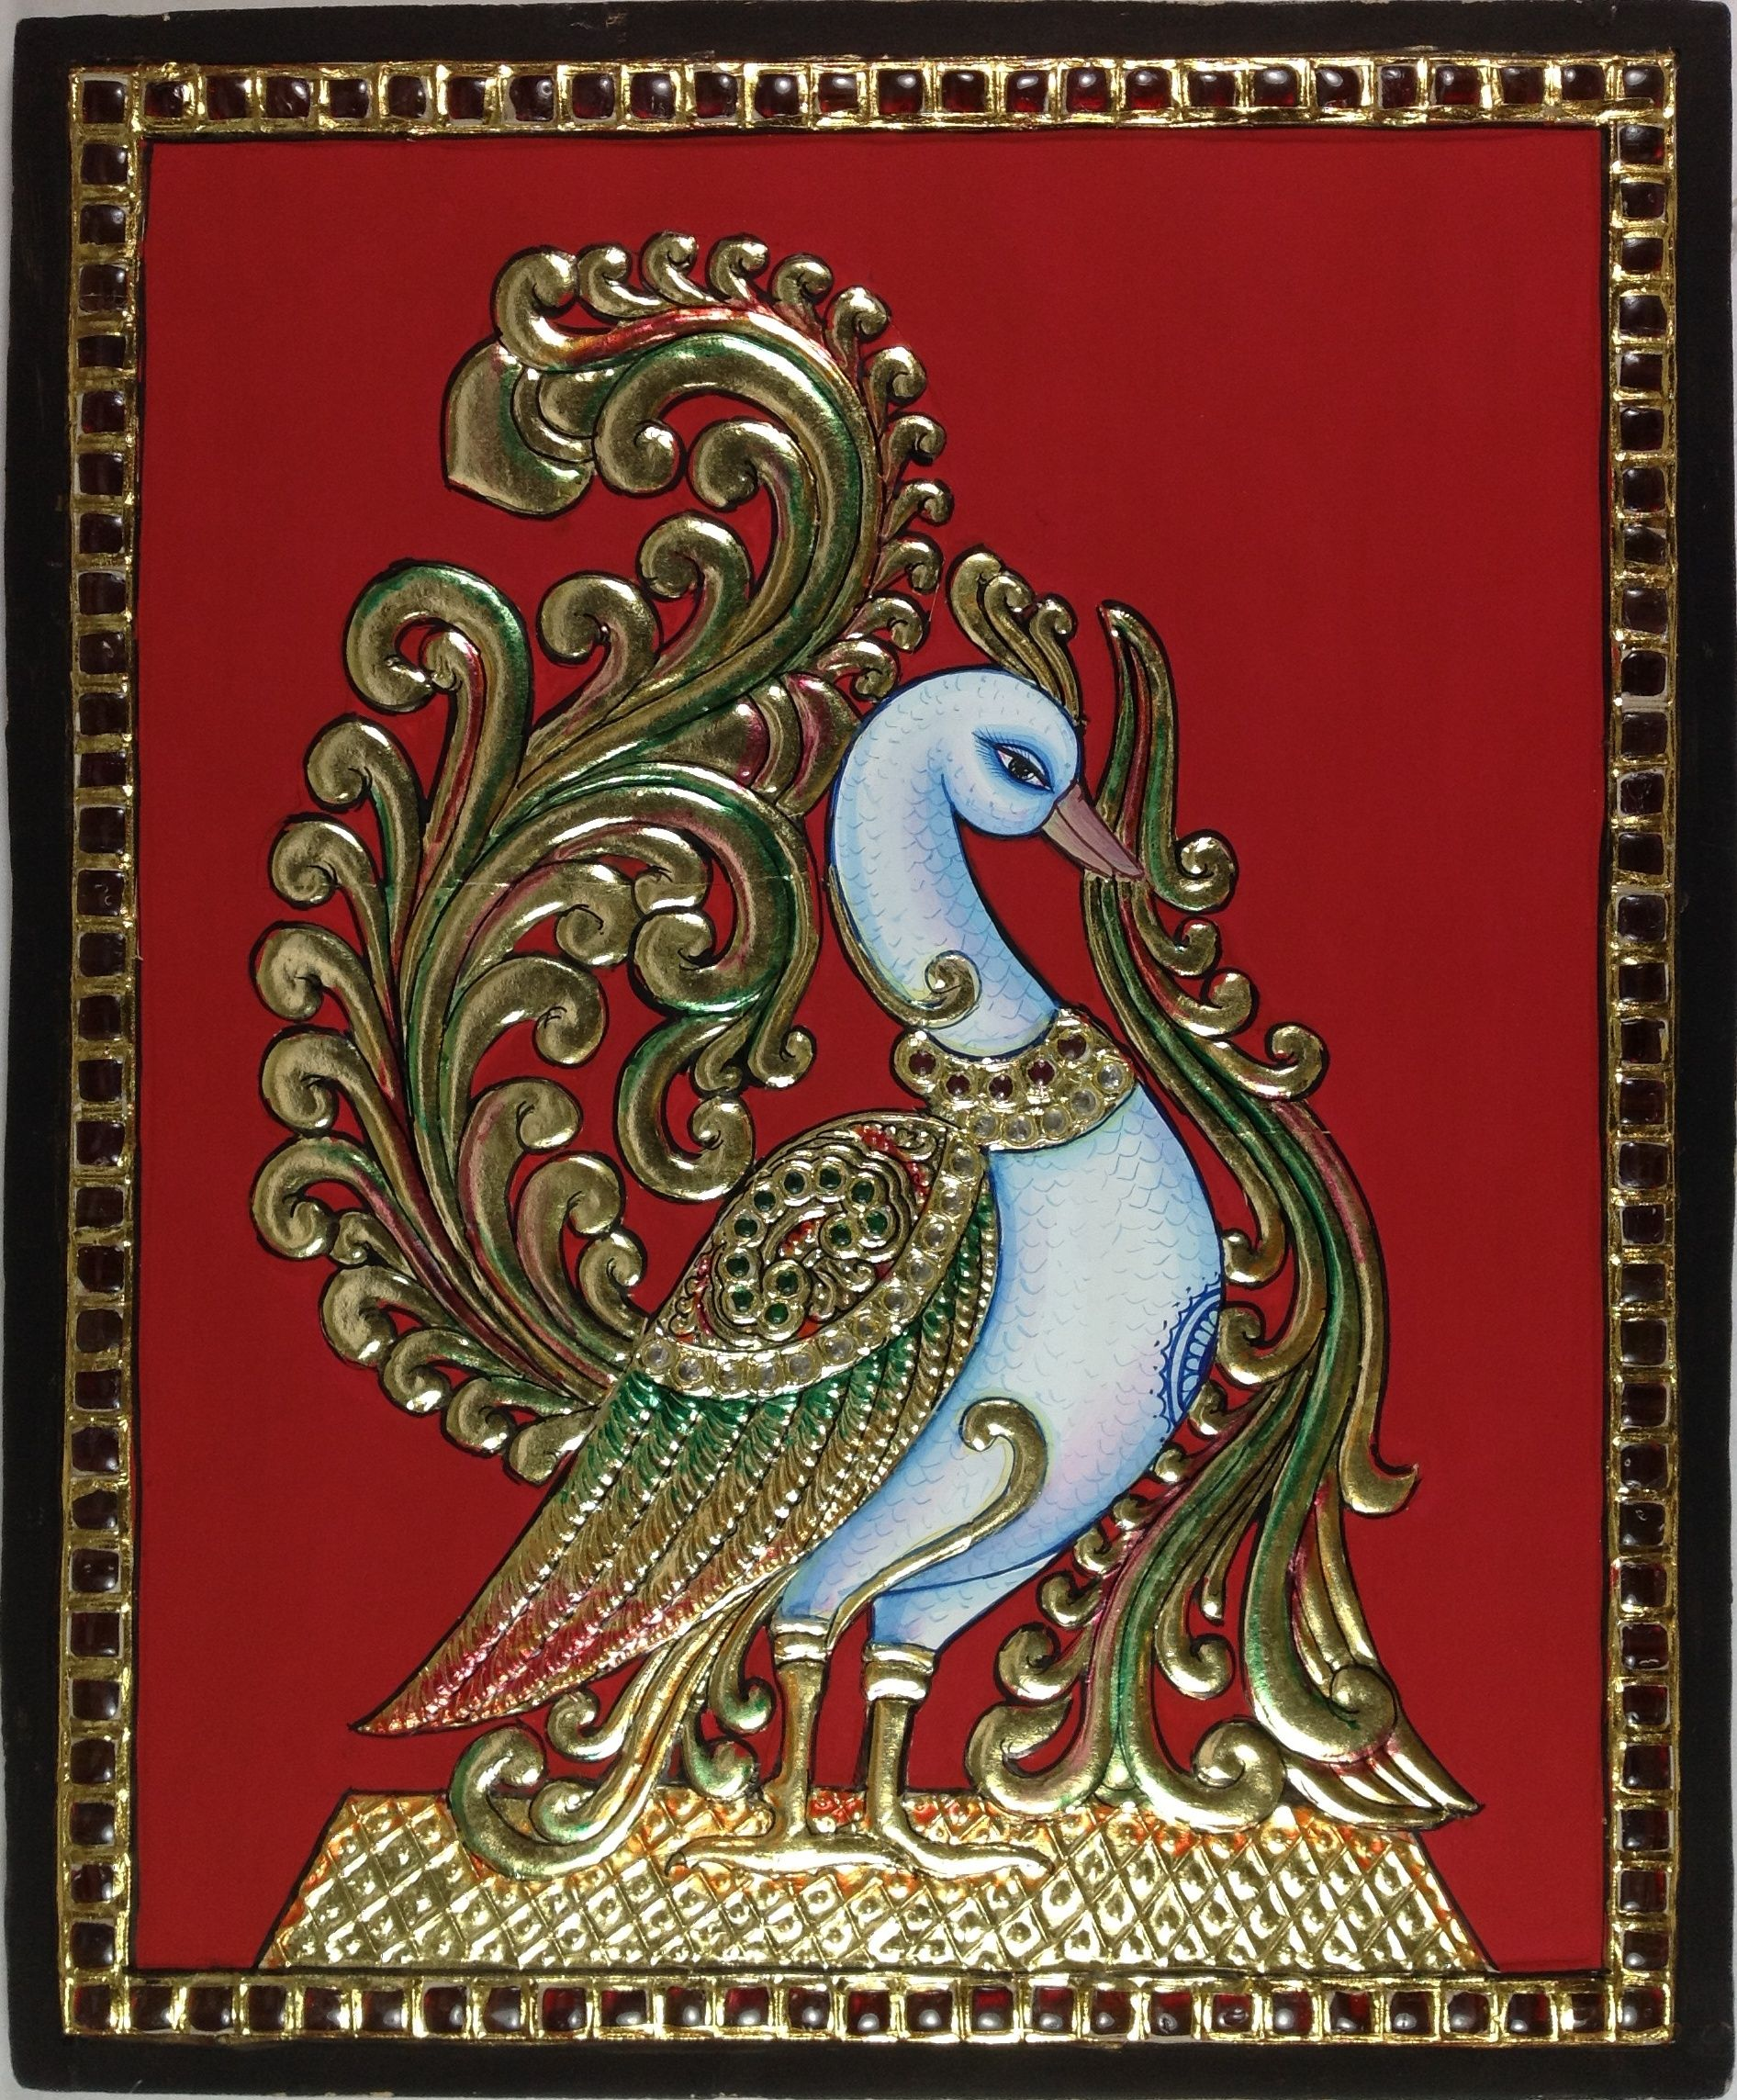 Indian Wall Decor tanjore painting handmade indian thanjavur wall decor gold swan